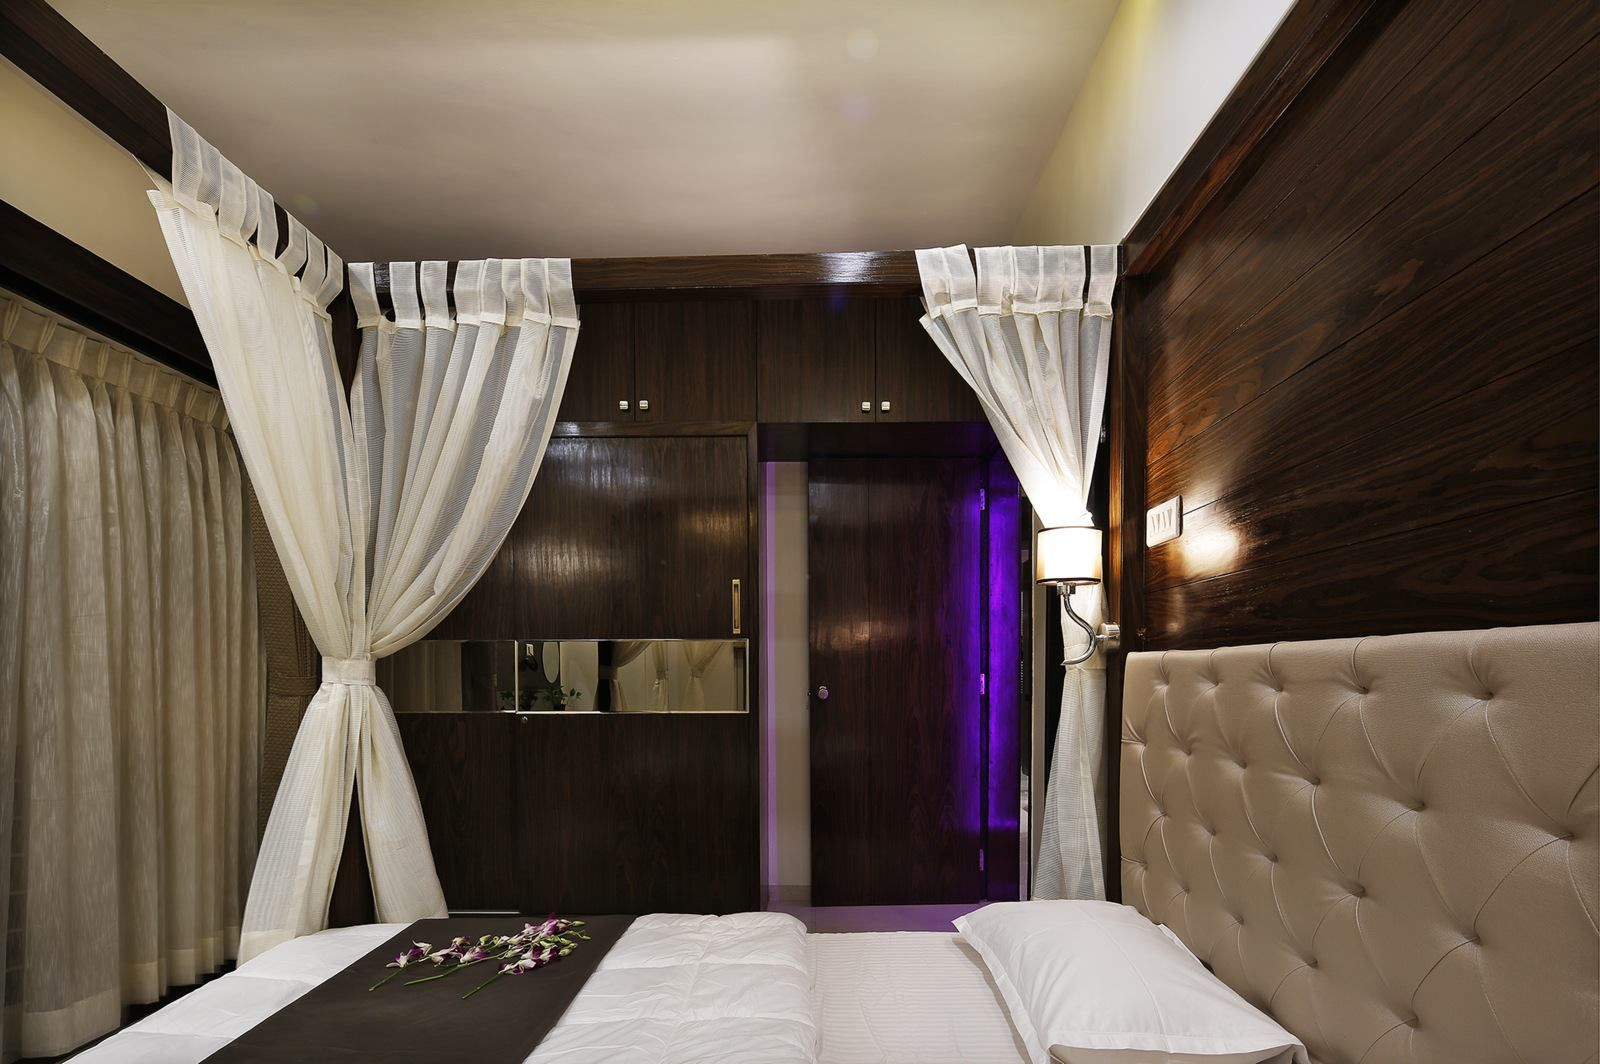 Master bedrooms luxury interior design by ogling inches design architects designerbedroom standardinterior urbanclaprooms